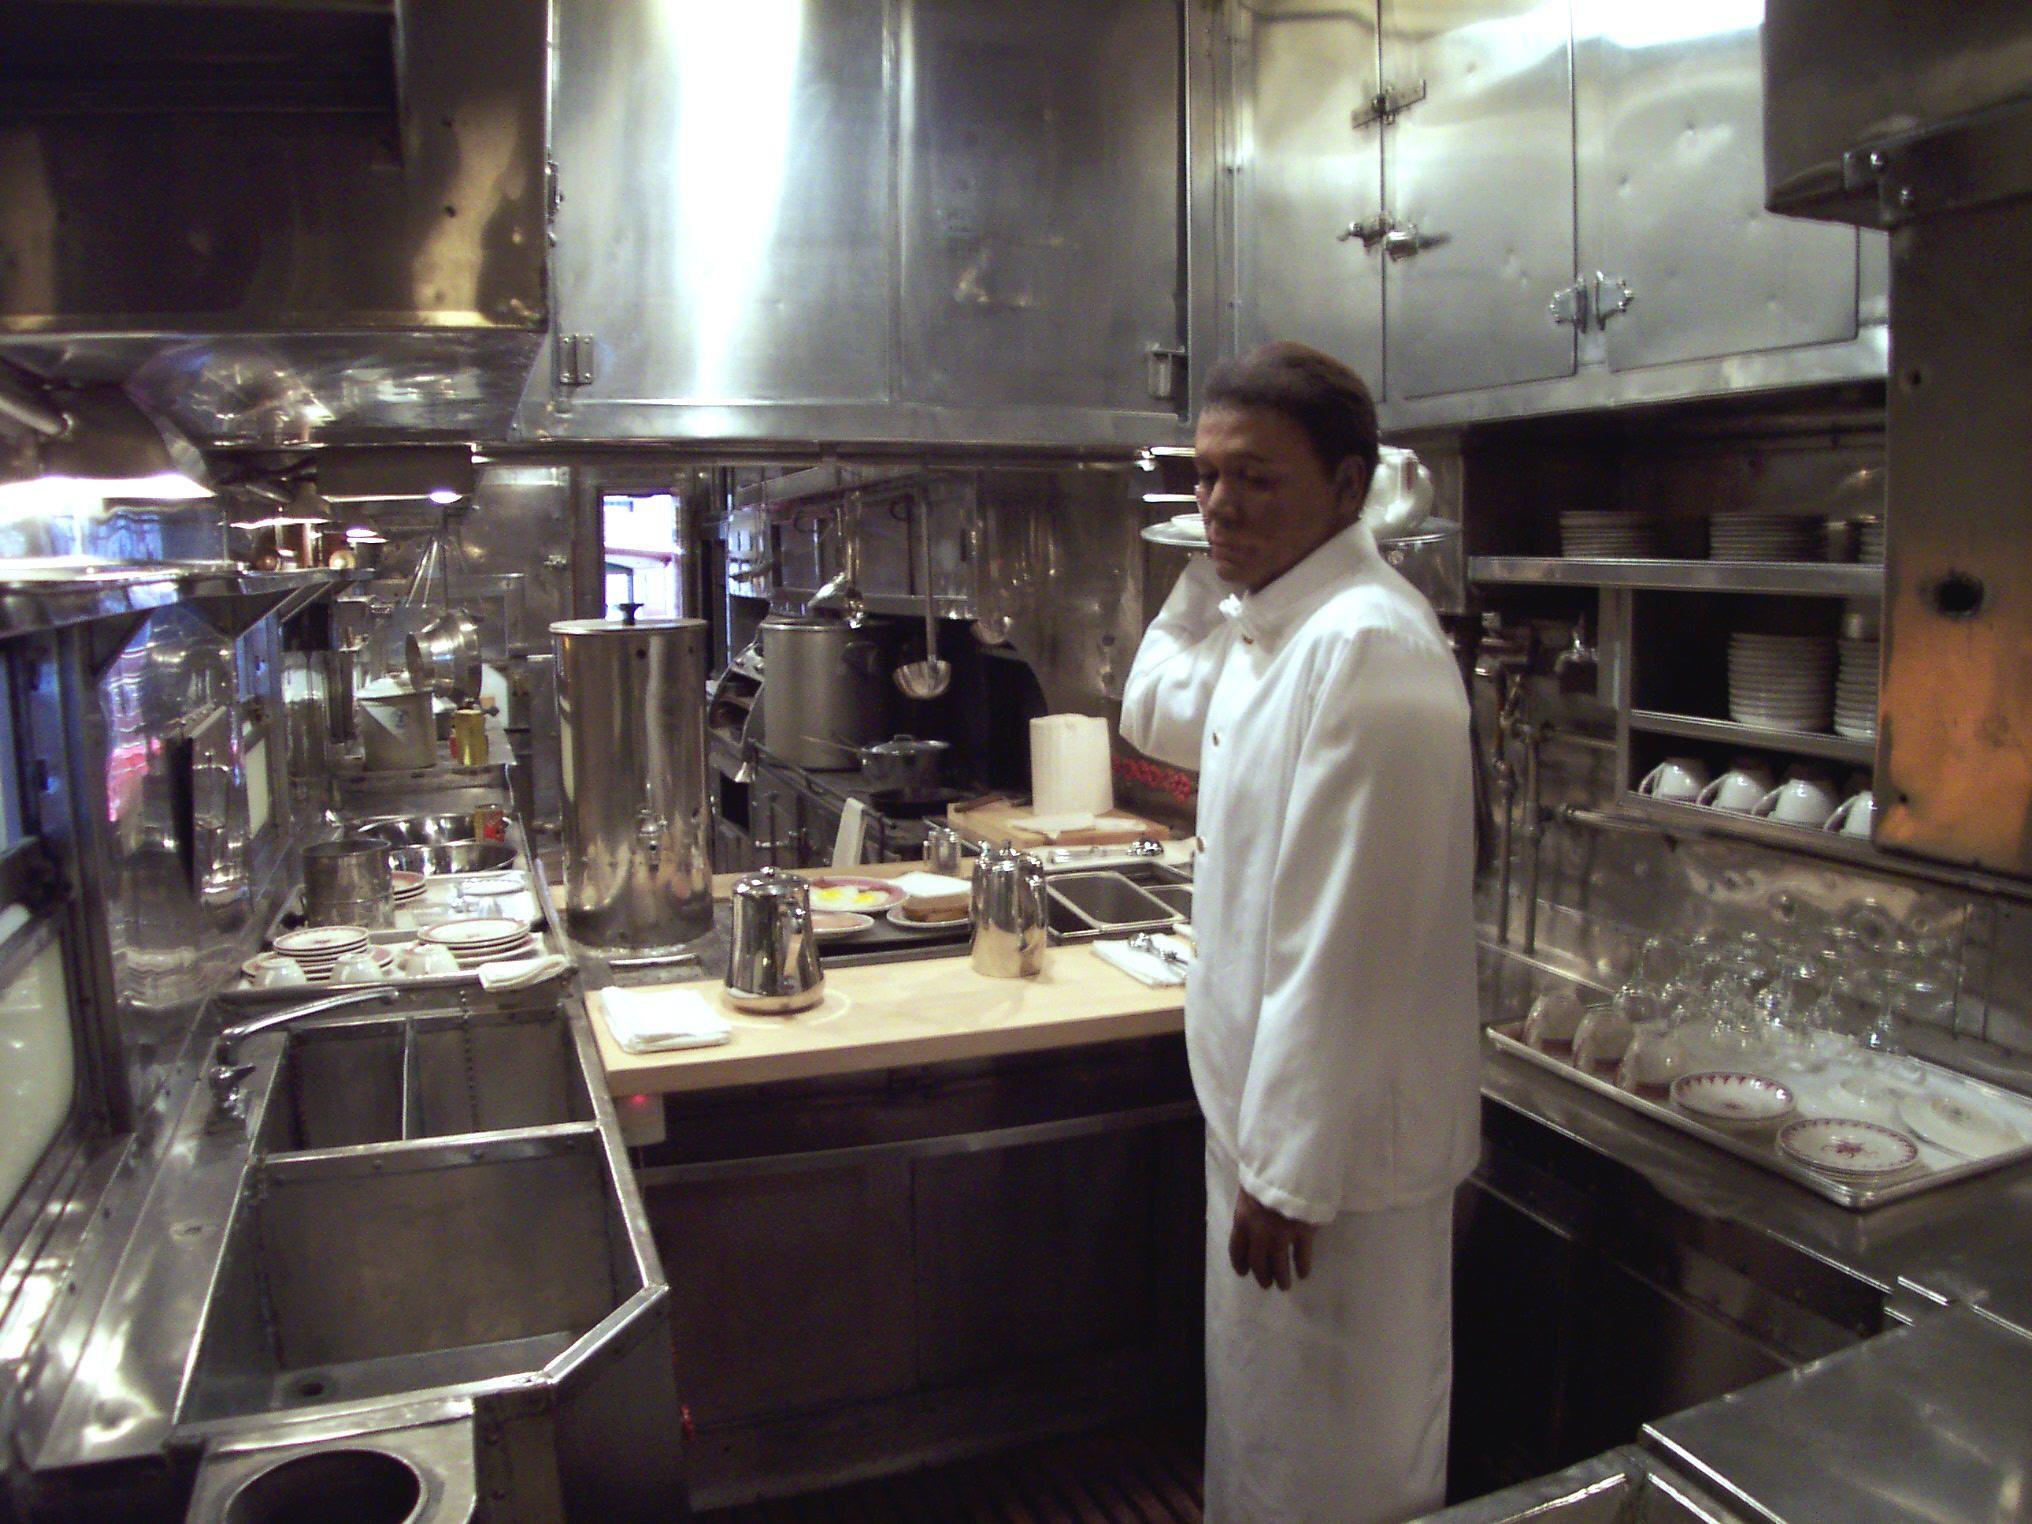 Train And Kitchens Google Search Tiny Kitchen Design Auto